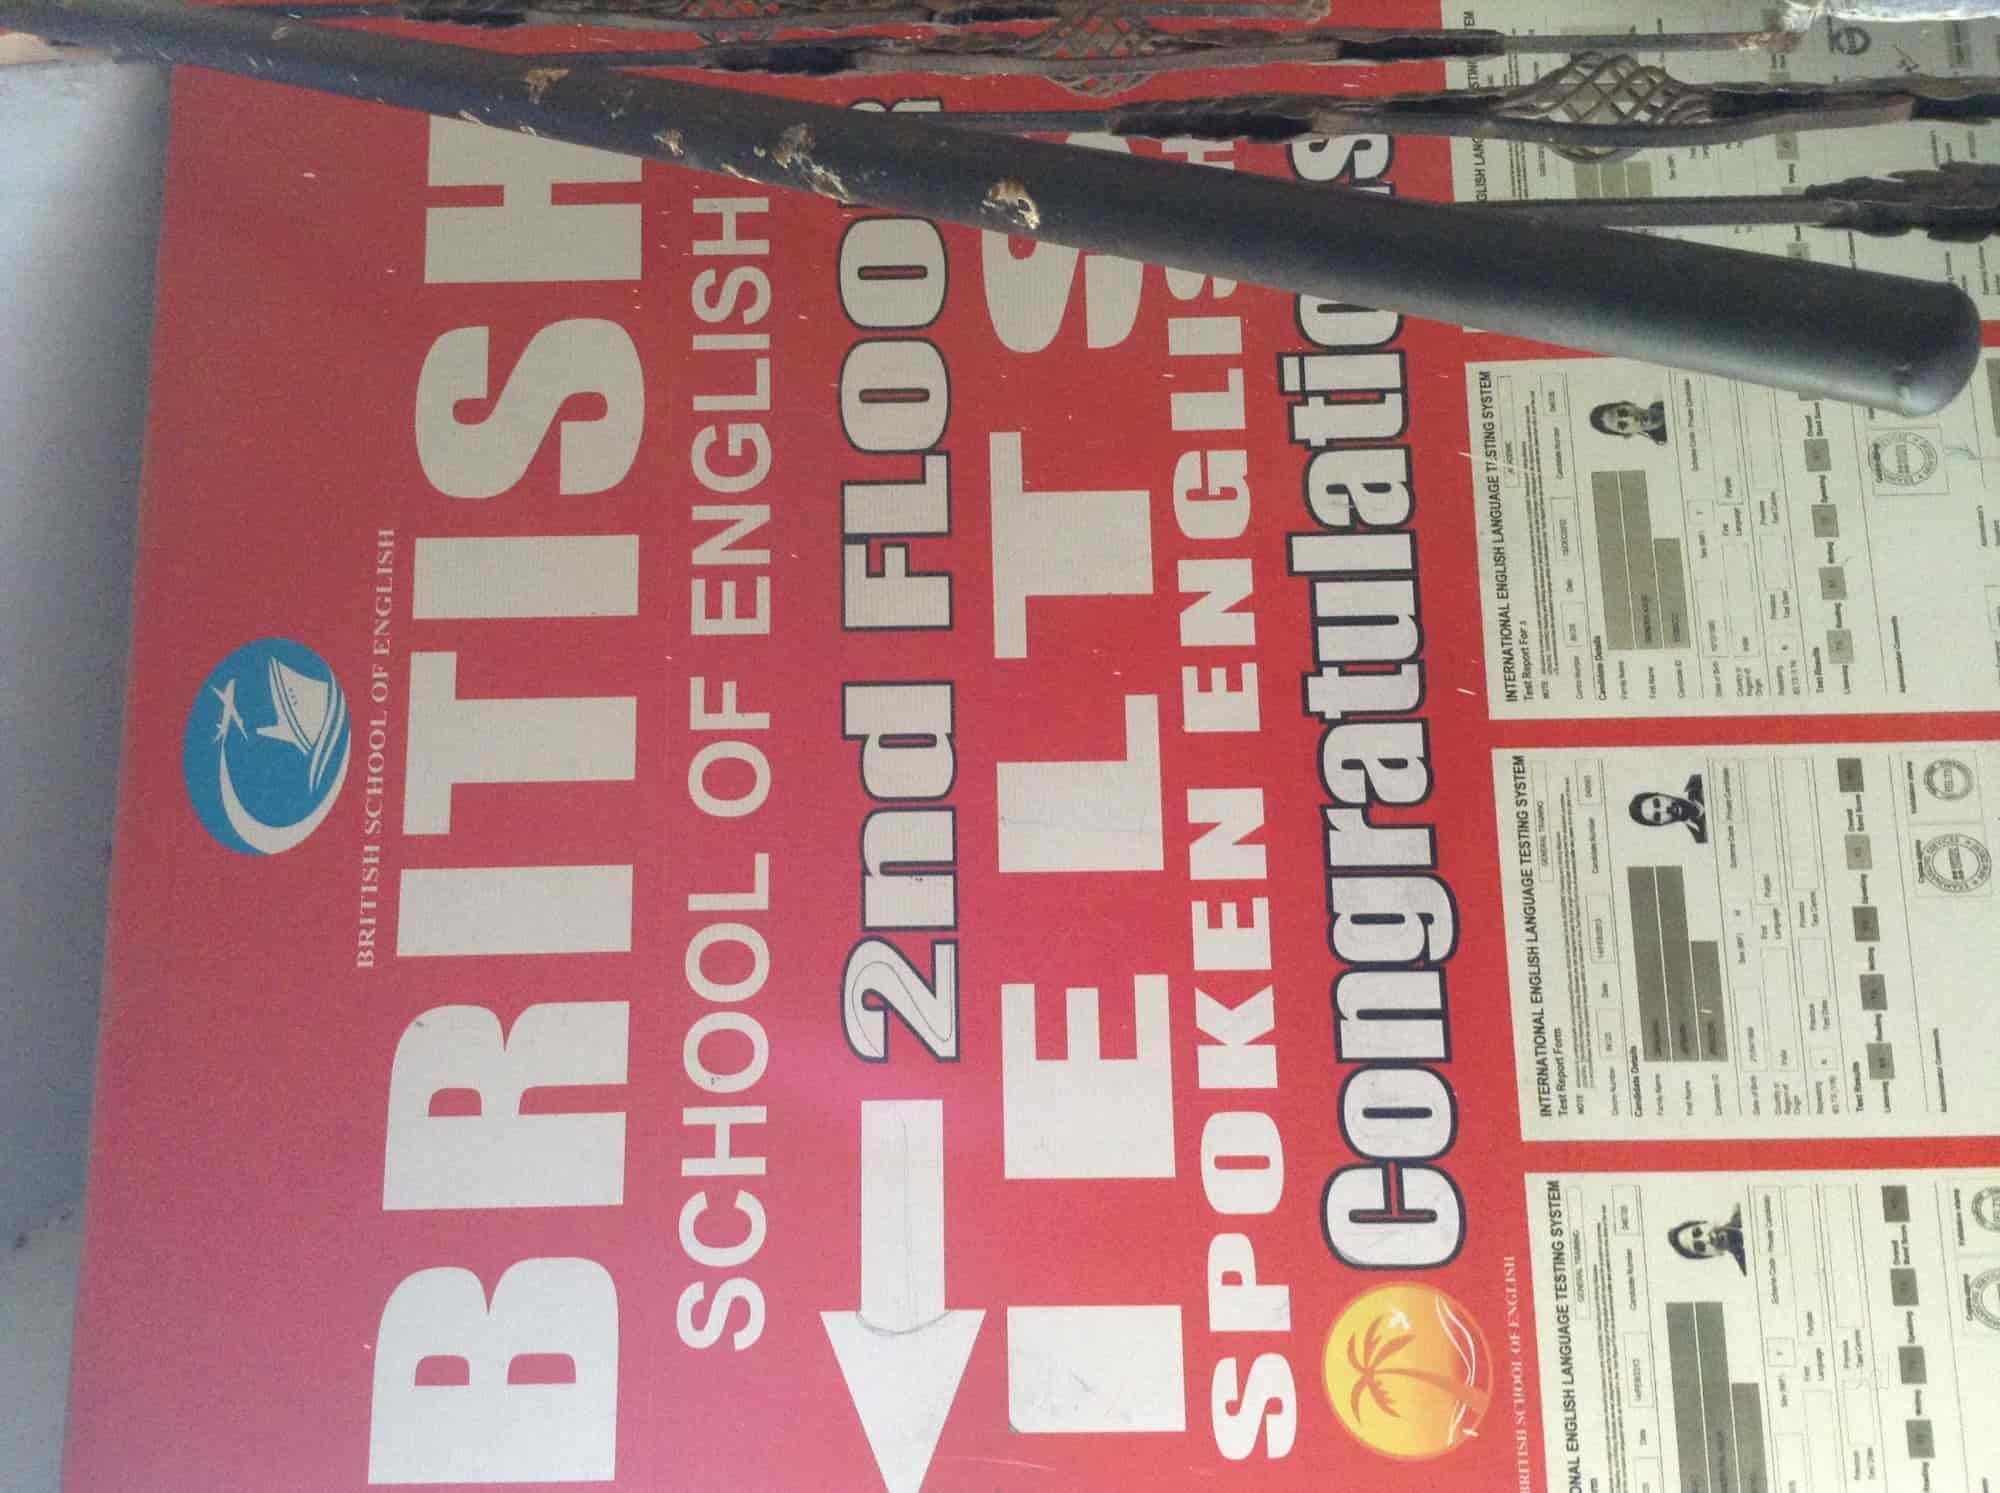 British School Of English, Chandigarh Sector 61 Phase 7 - Tutorials